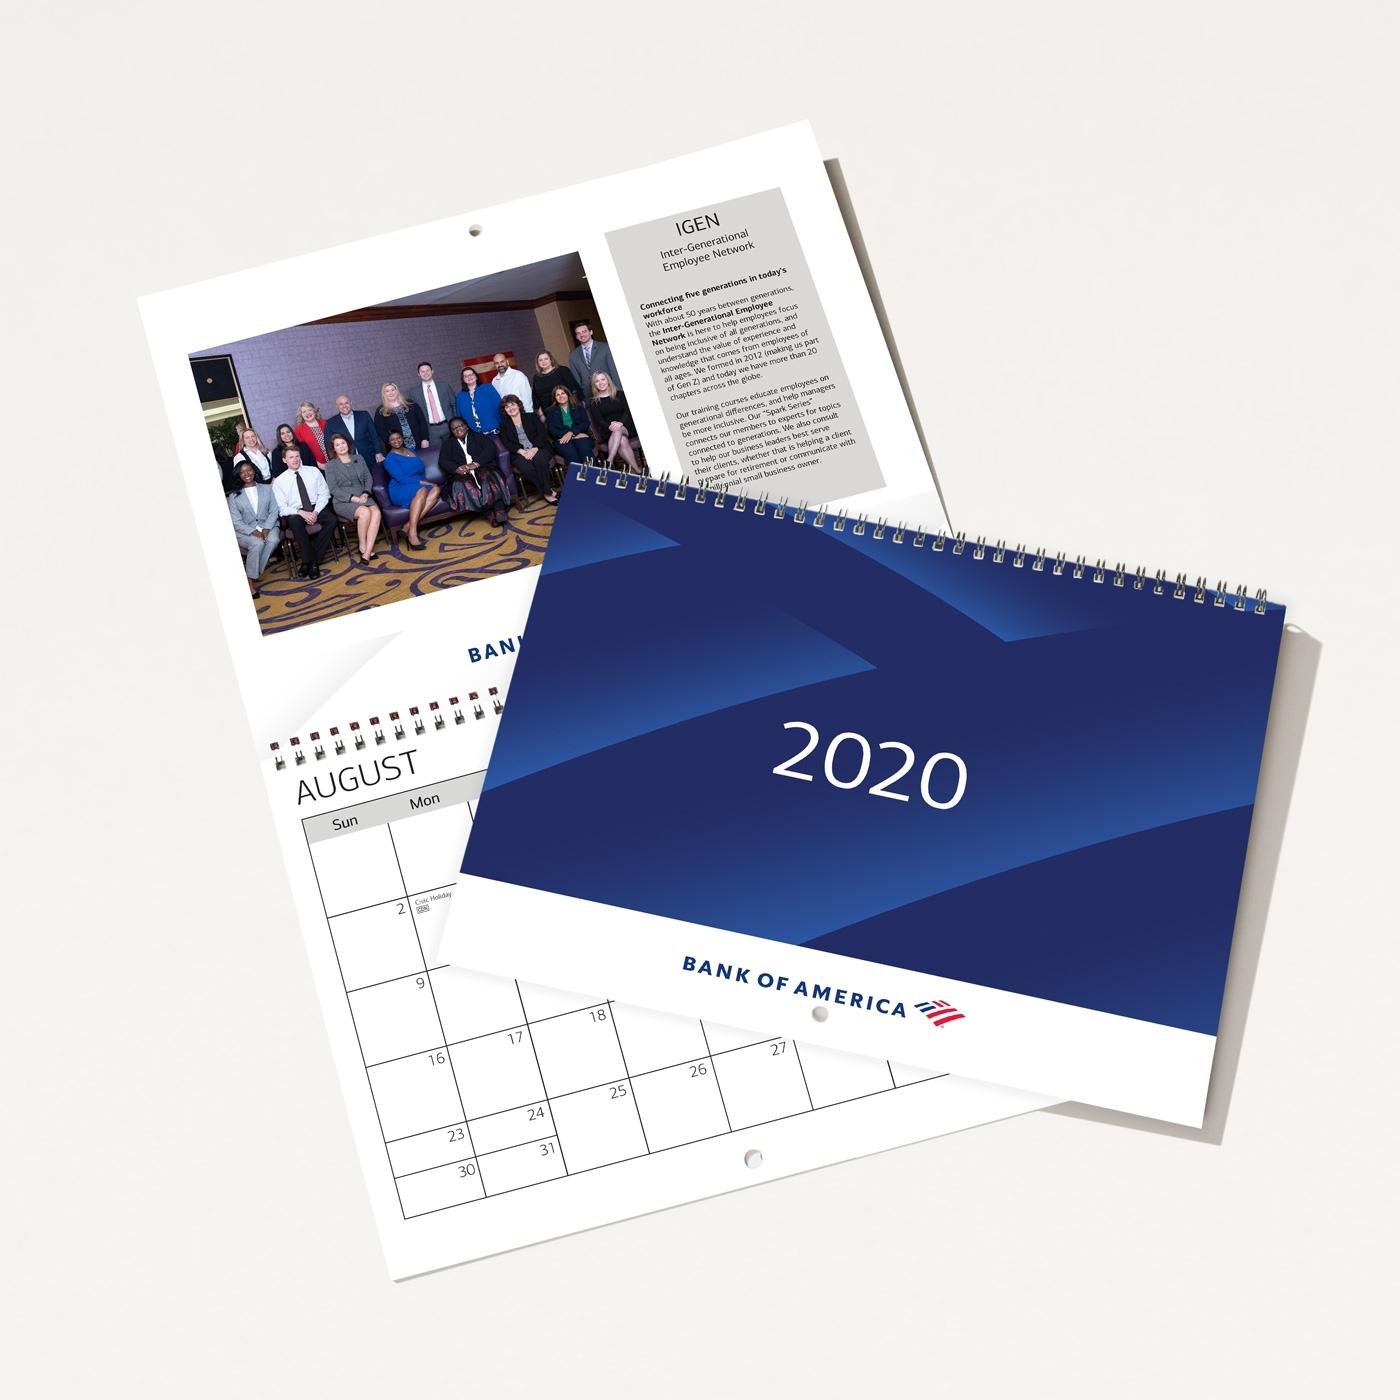 Bank Of America 2020 Wall Calendar | Bank Of America Store